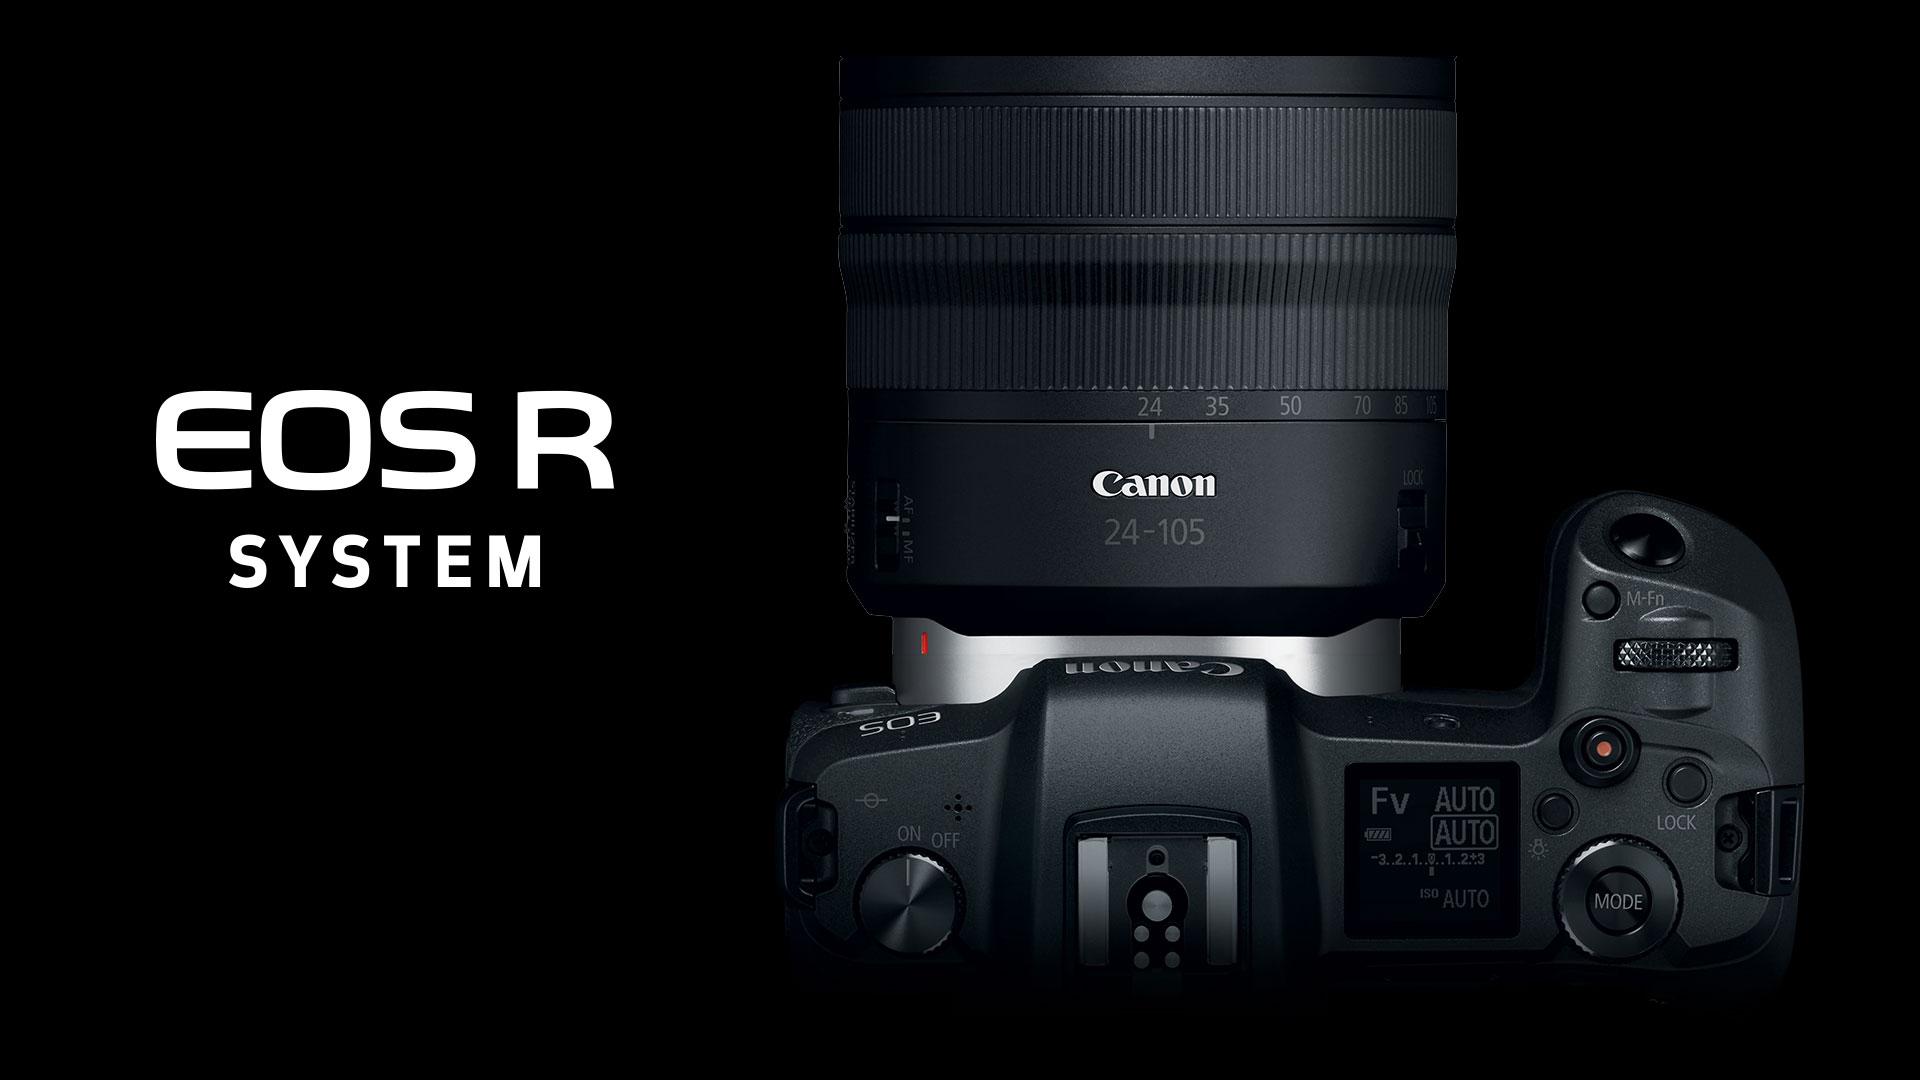 Canon announces full-frame mirrorless EOS R camera